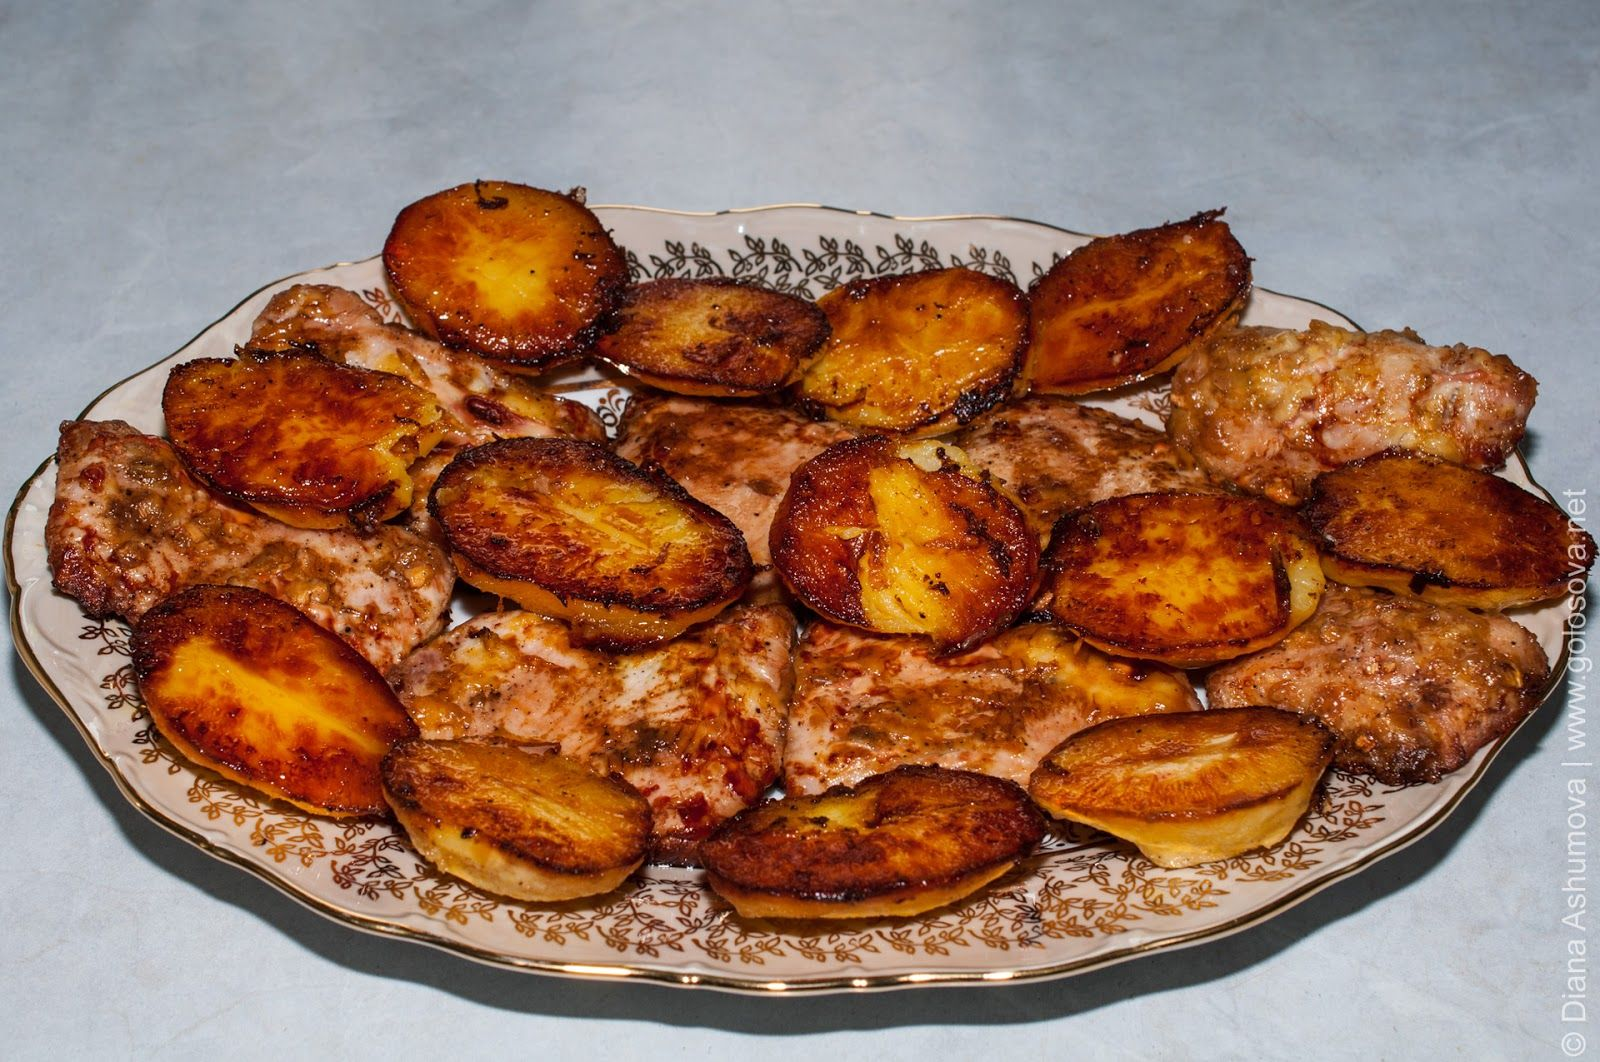 блюда из филе индейки рецепты Филе индейки - рецепты с фото на Повар.ру (112 рецептов.